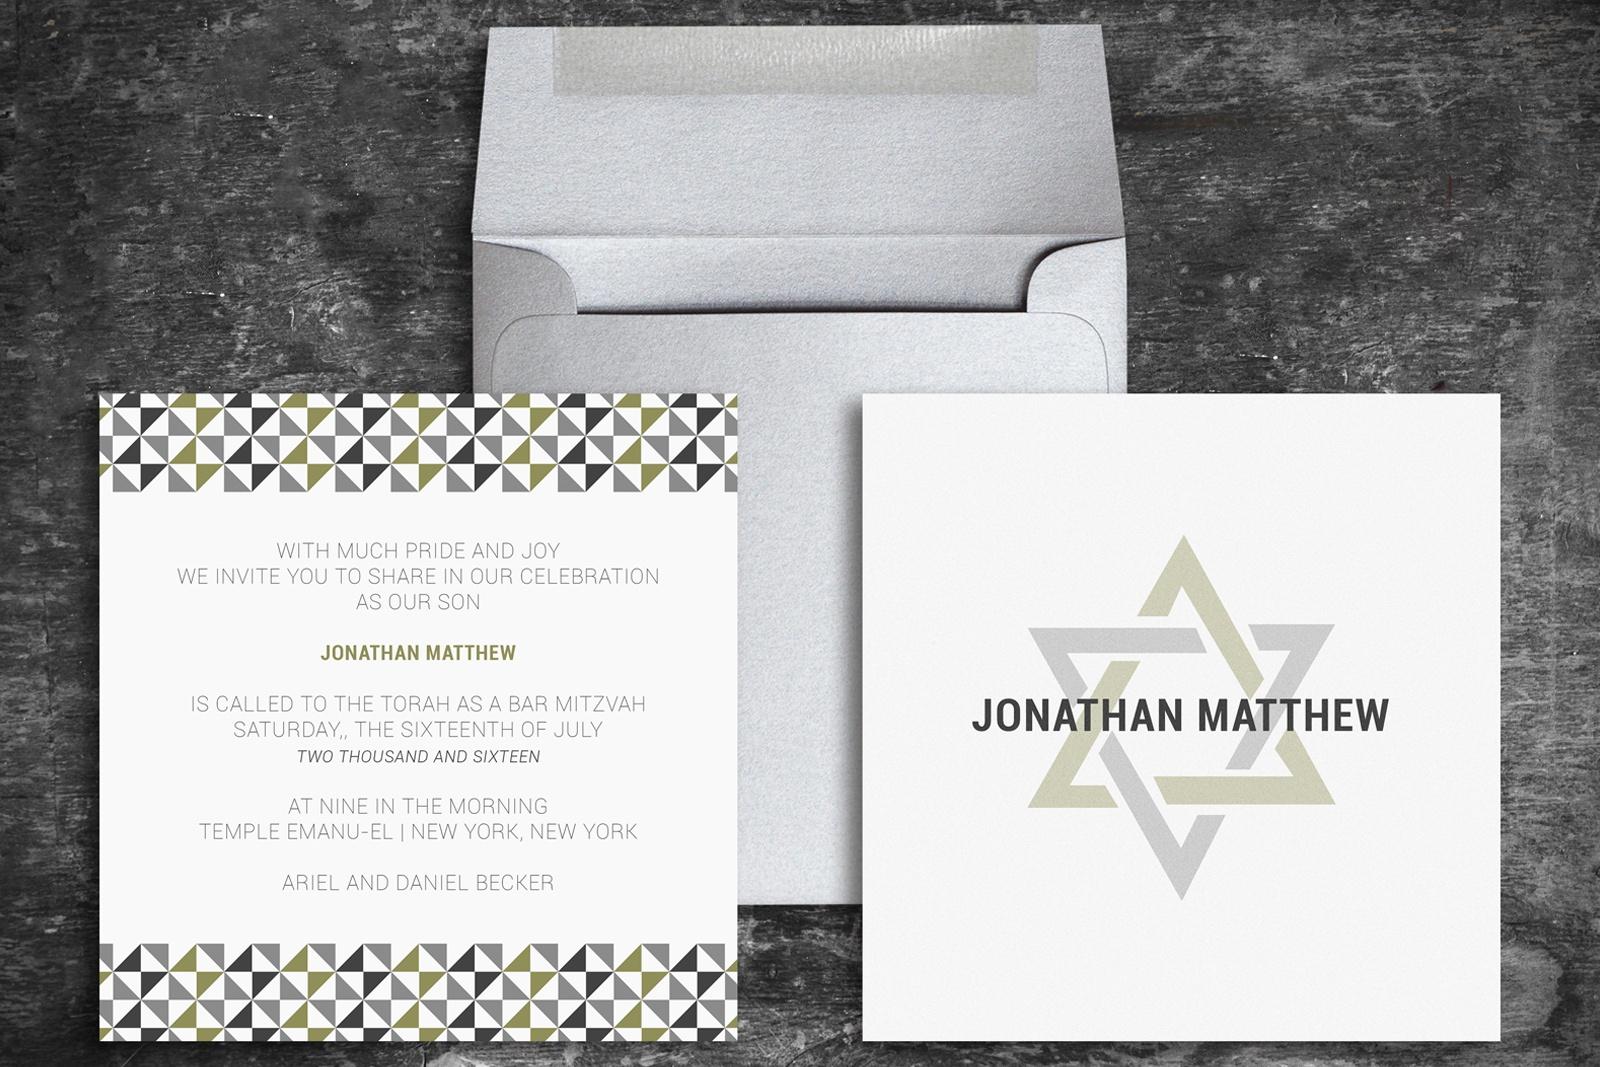 Custom Bar Mitzvah Invitation and Envelope